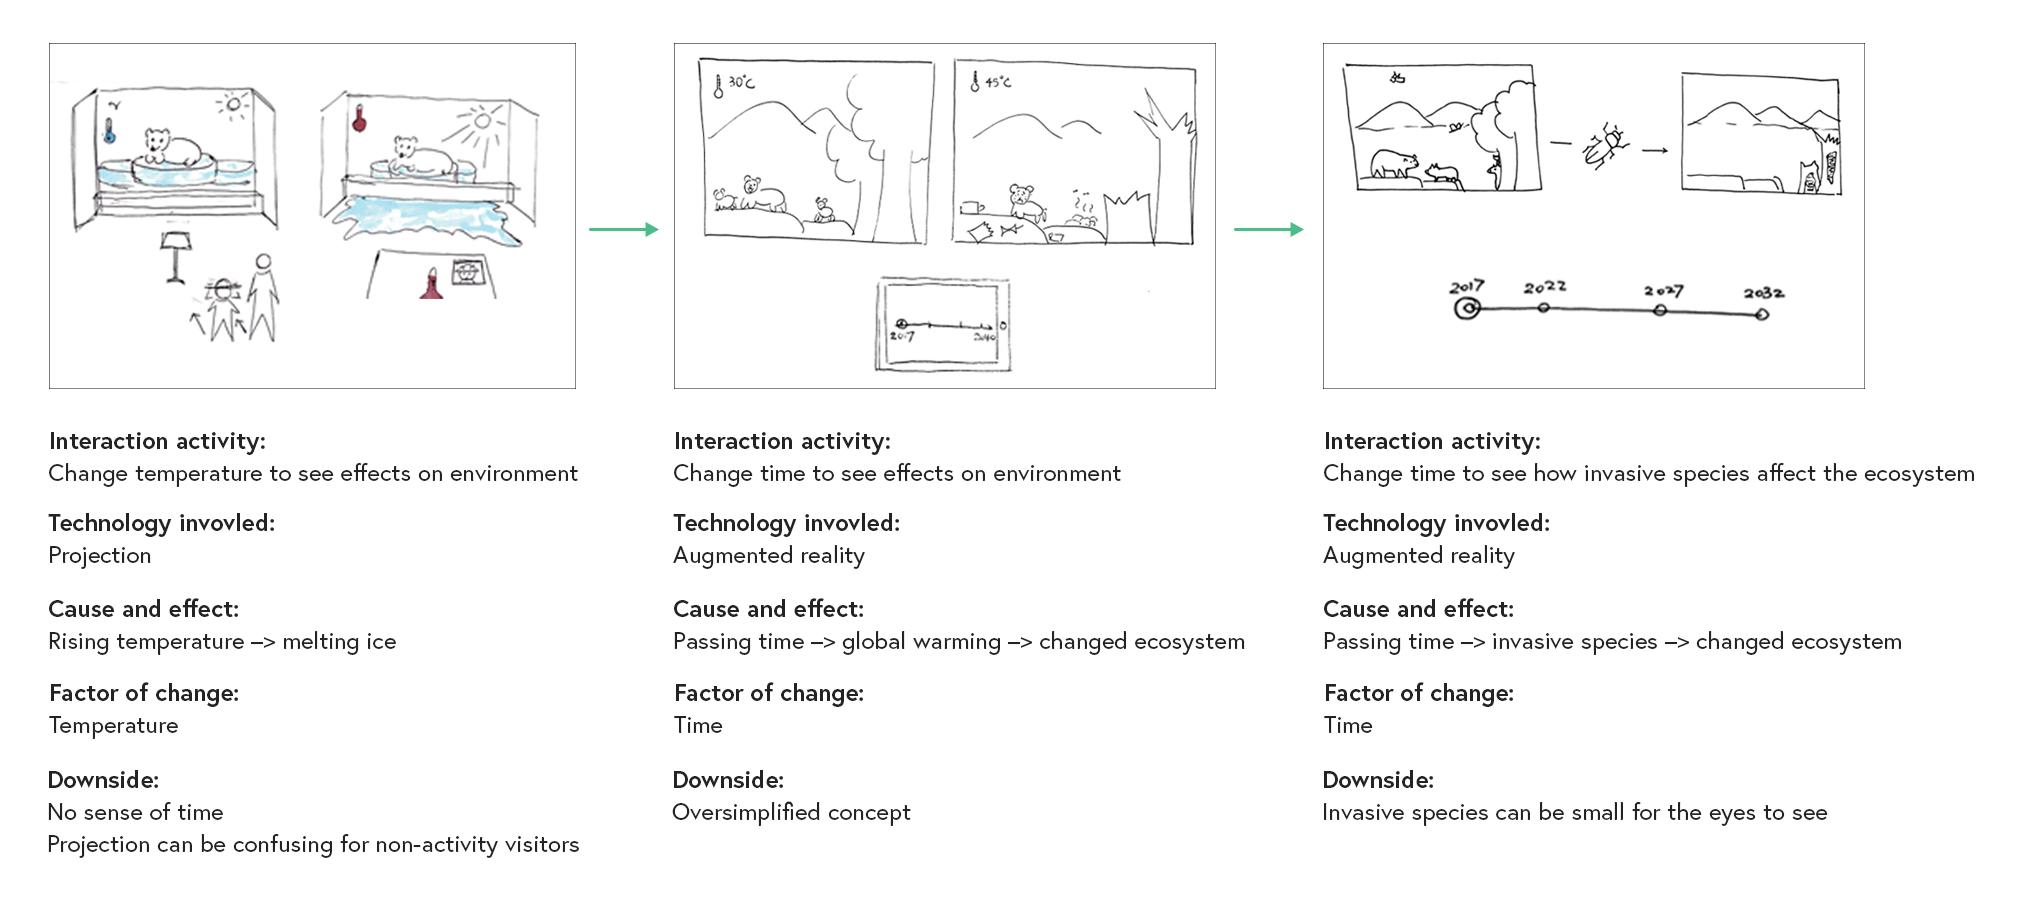 progression-of-activity-ideaArtboard-1.png